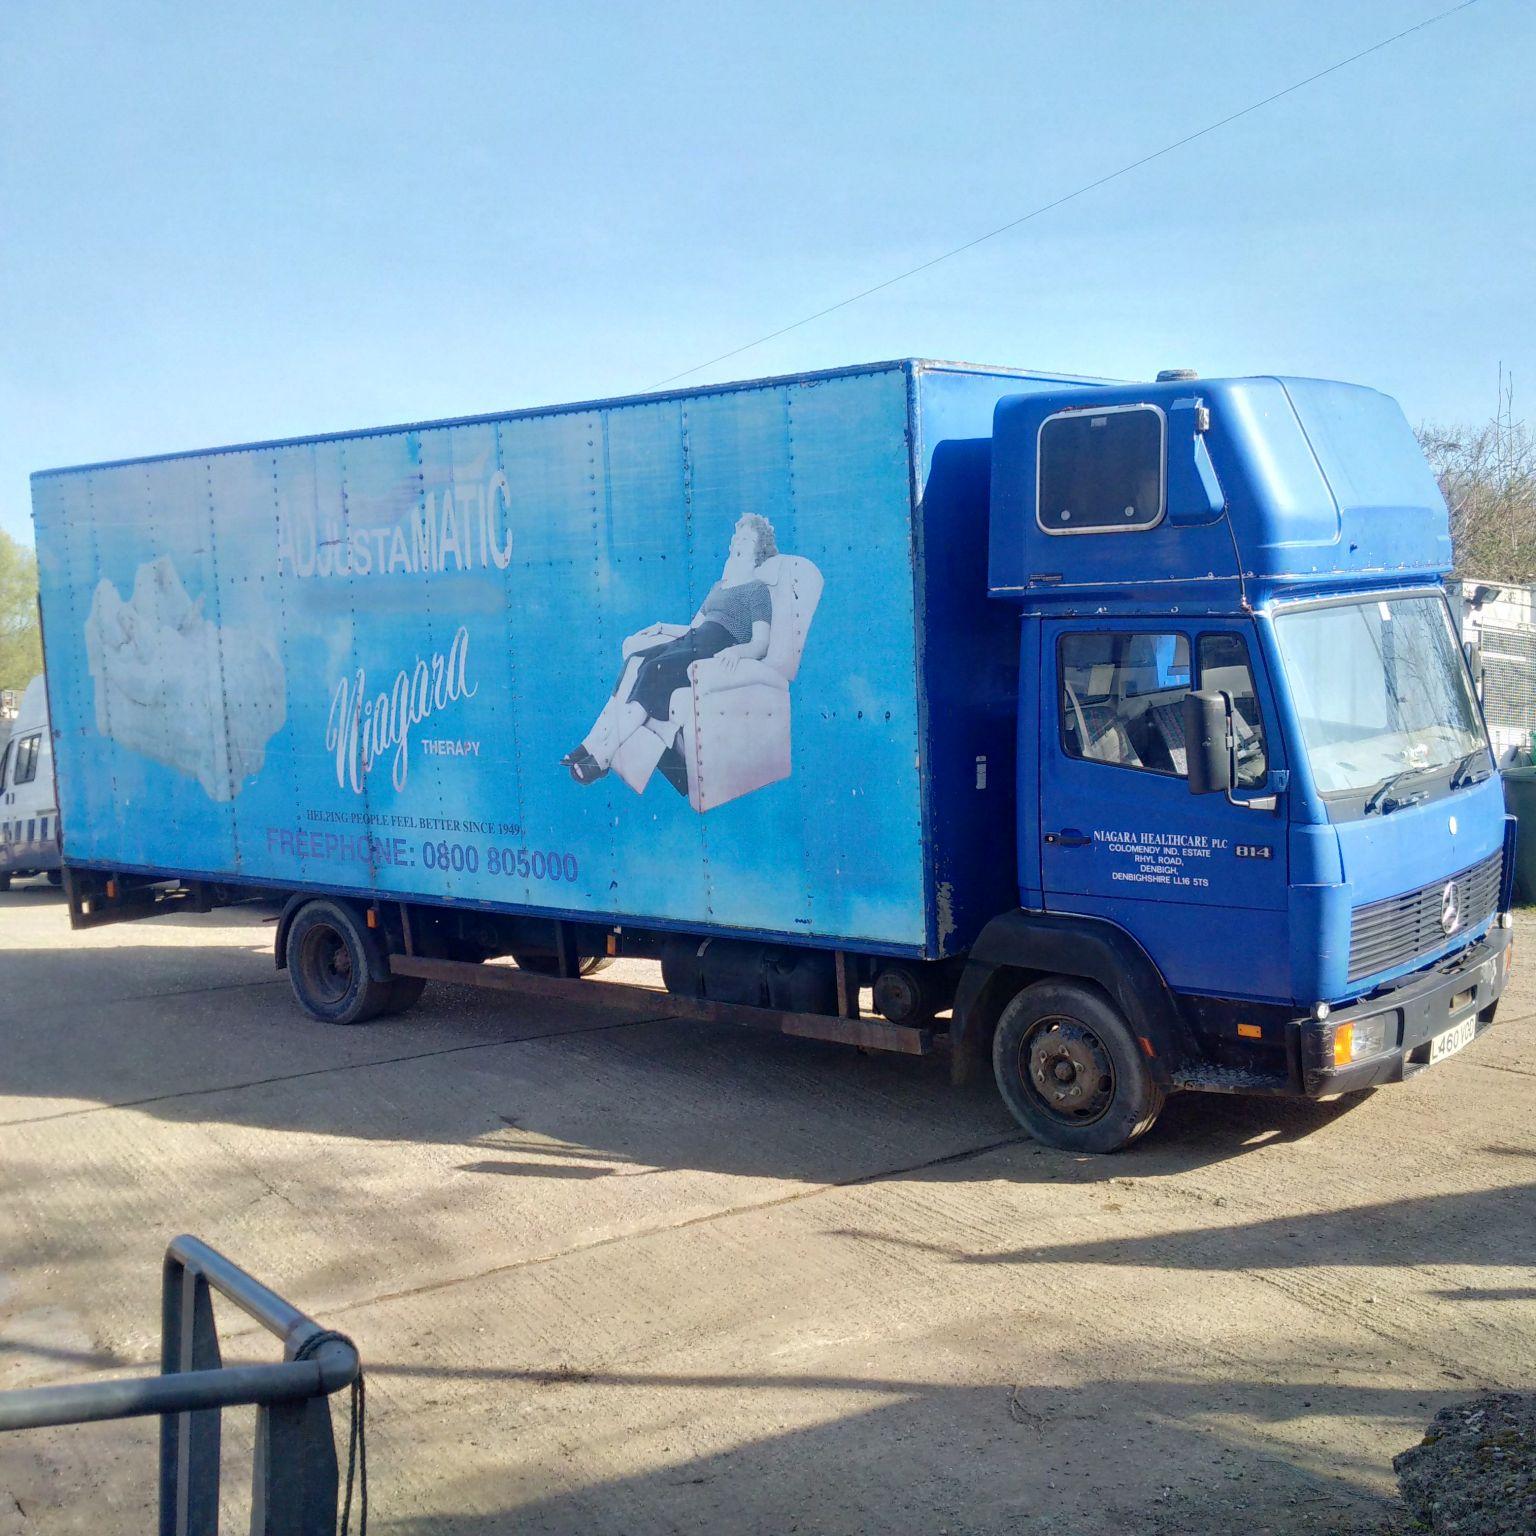 Mercedes Benz 814 7.5 Ton box lorry.